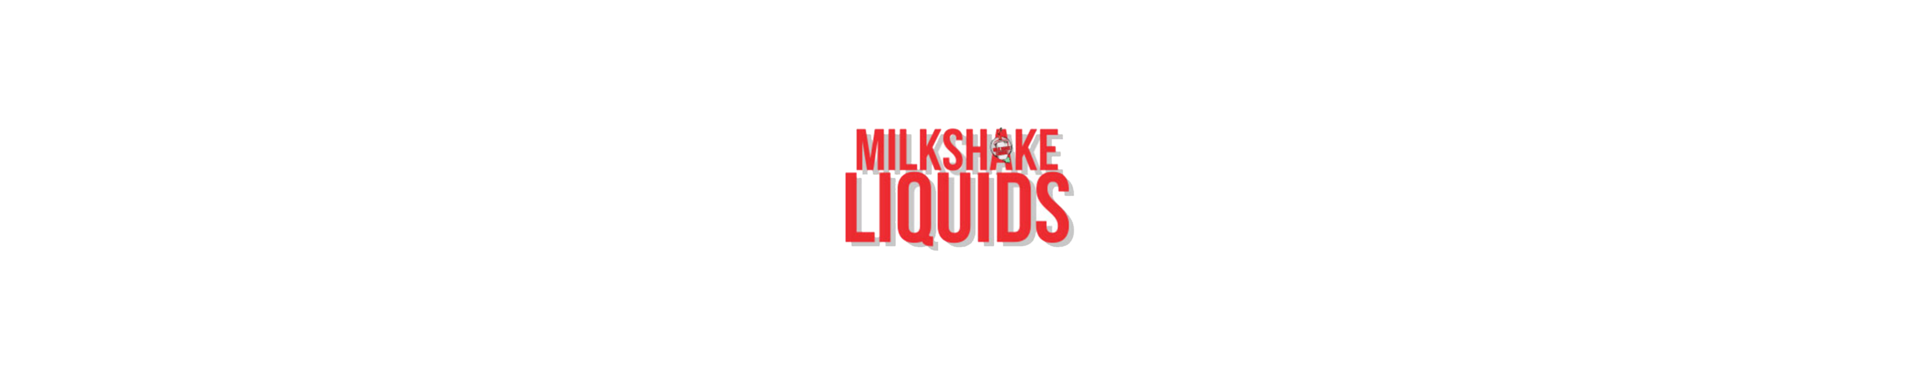 Milk Shake Liquids